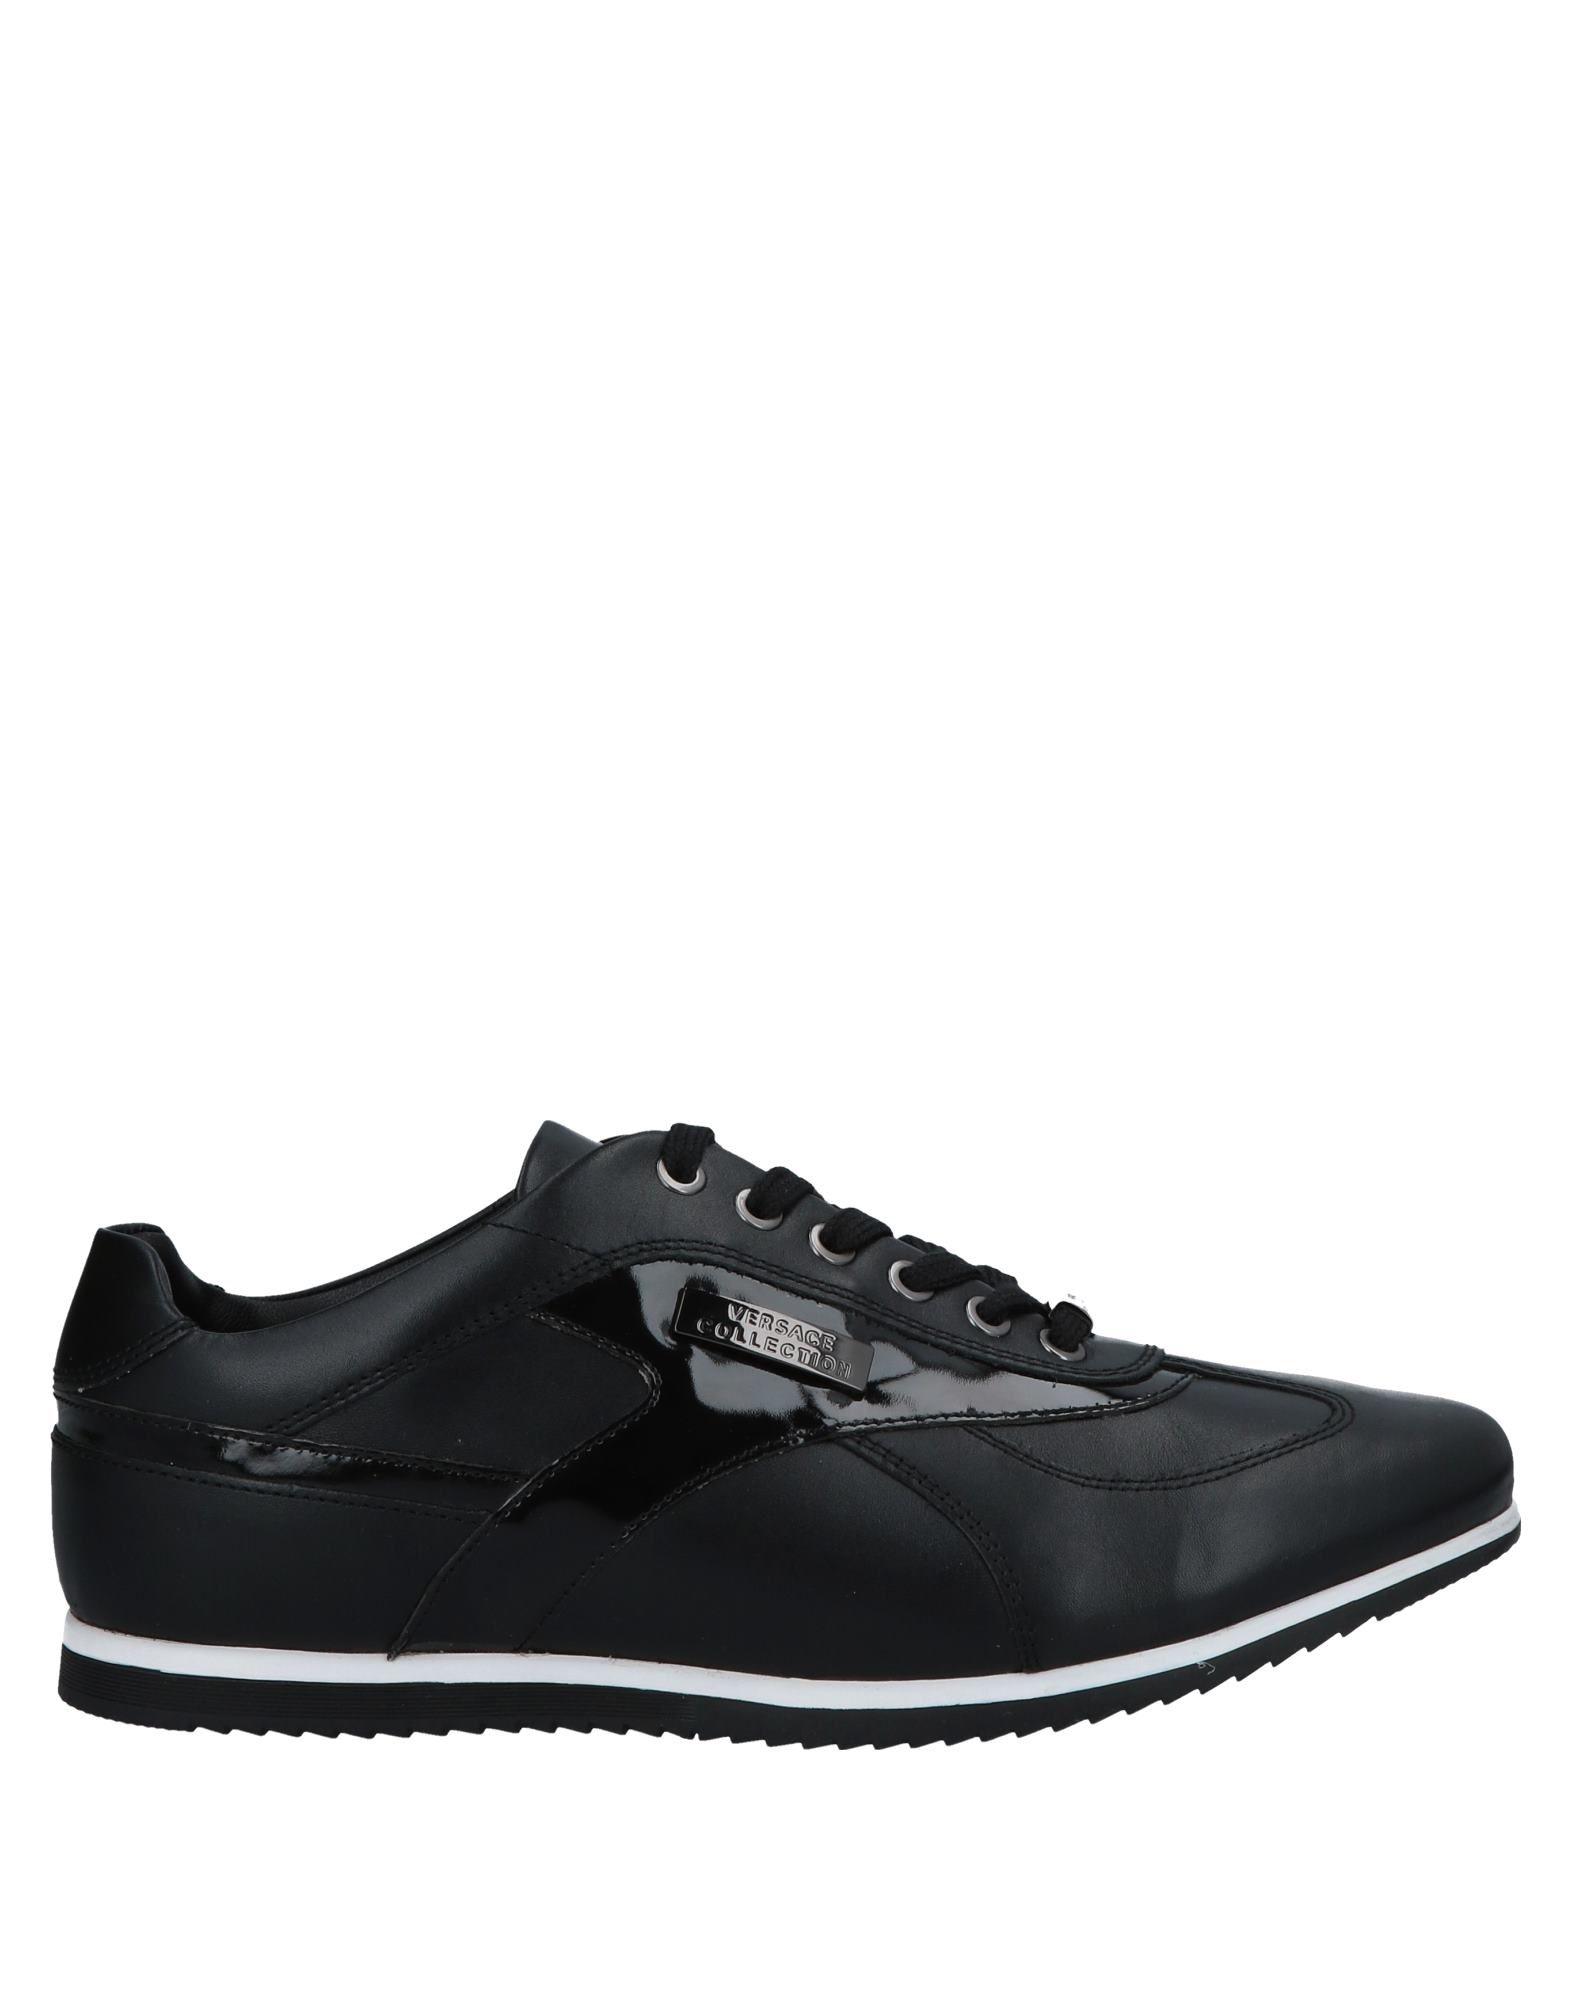 818ea081 Versace Collection men's sneakers: high-top, low-top & slip on | YOOX